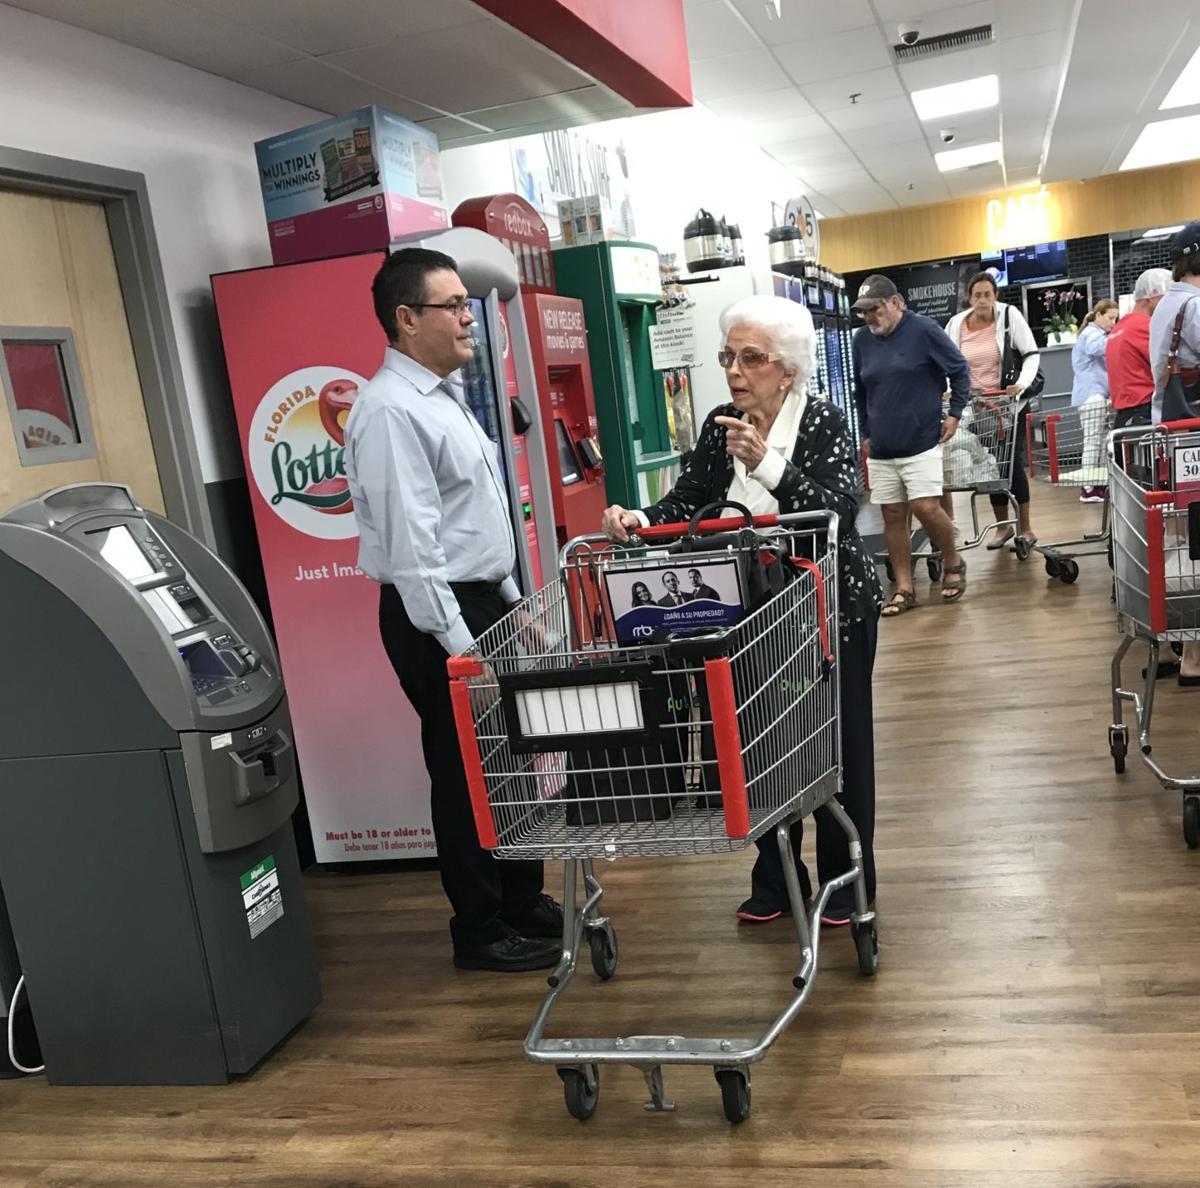 Winn Dixie senior shopping hour